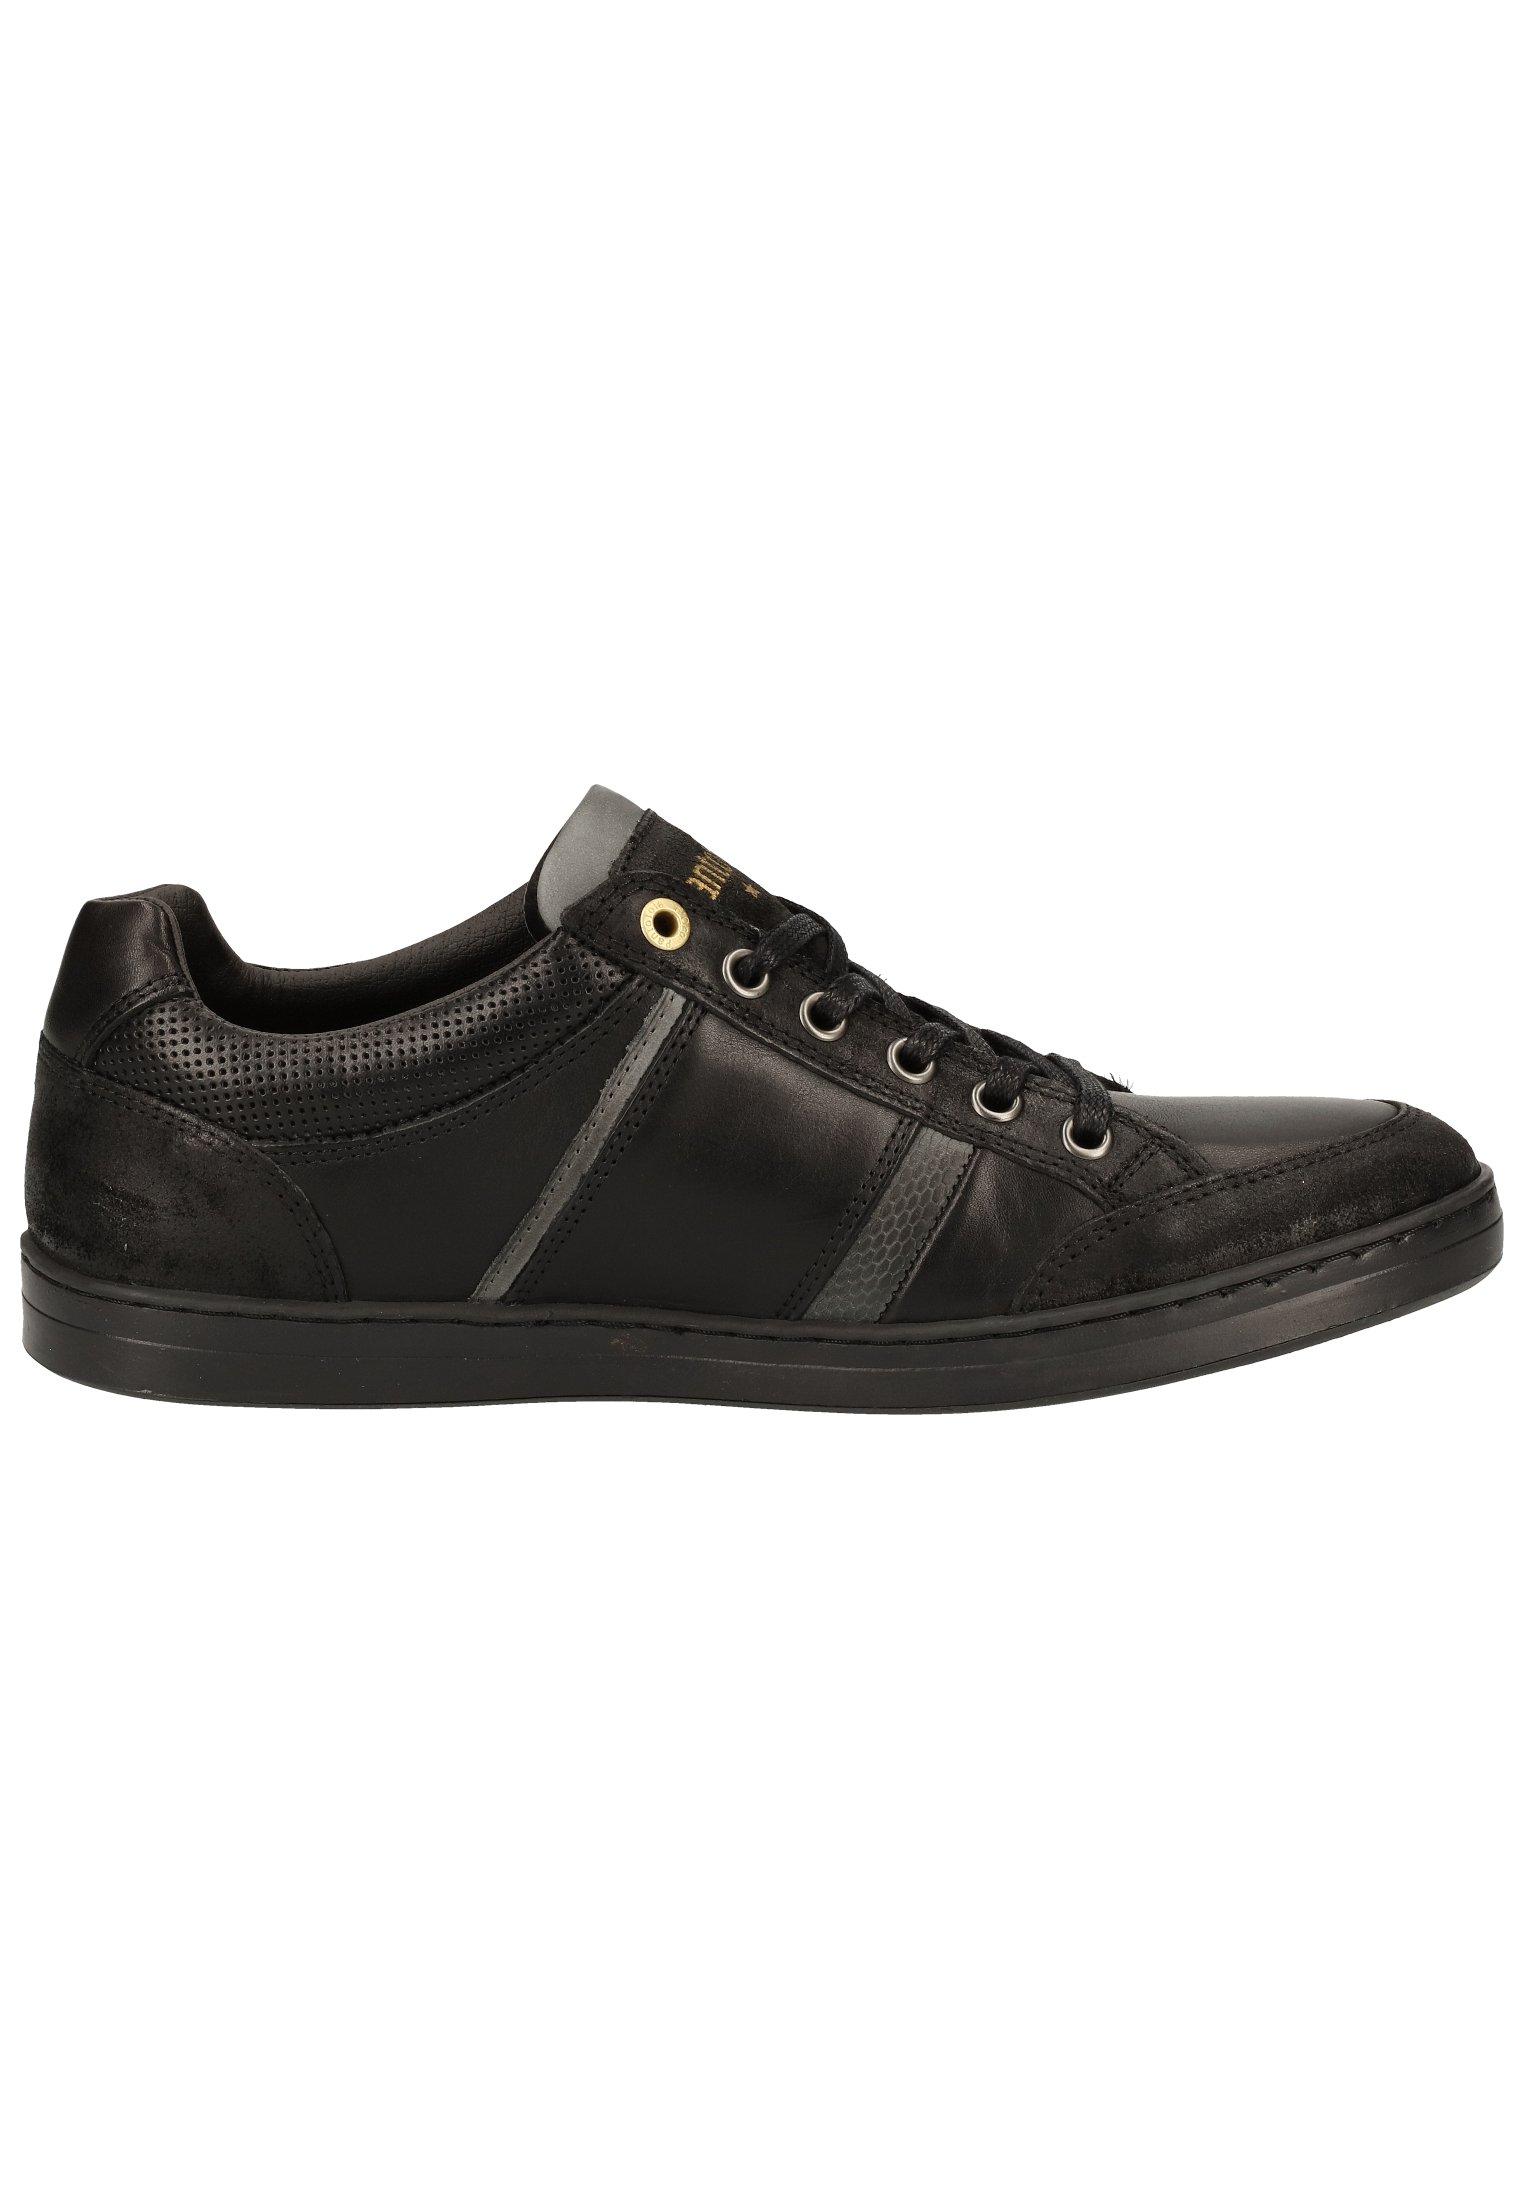 Pantofola dOro Sneaker low - black/schwarz - Herrenschuhe APETN